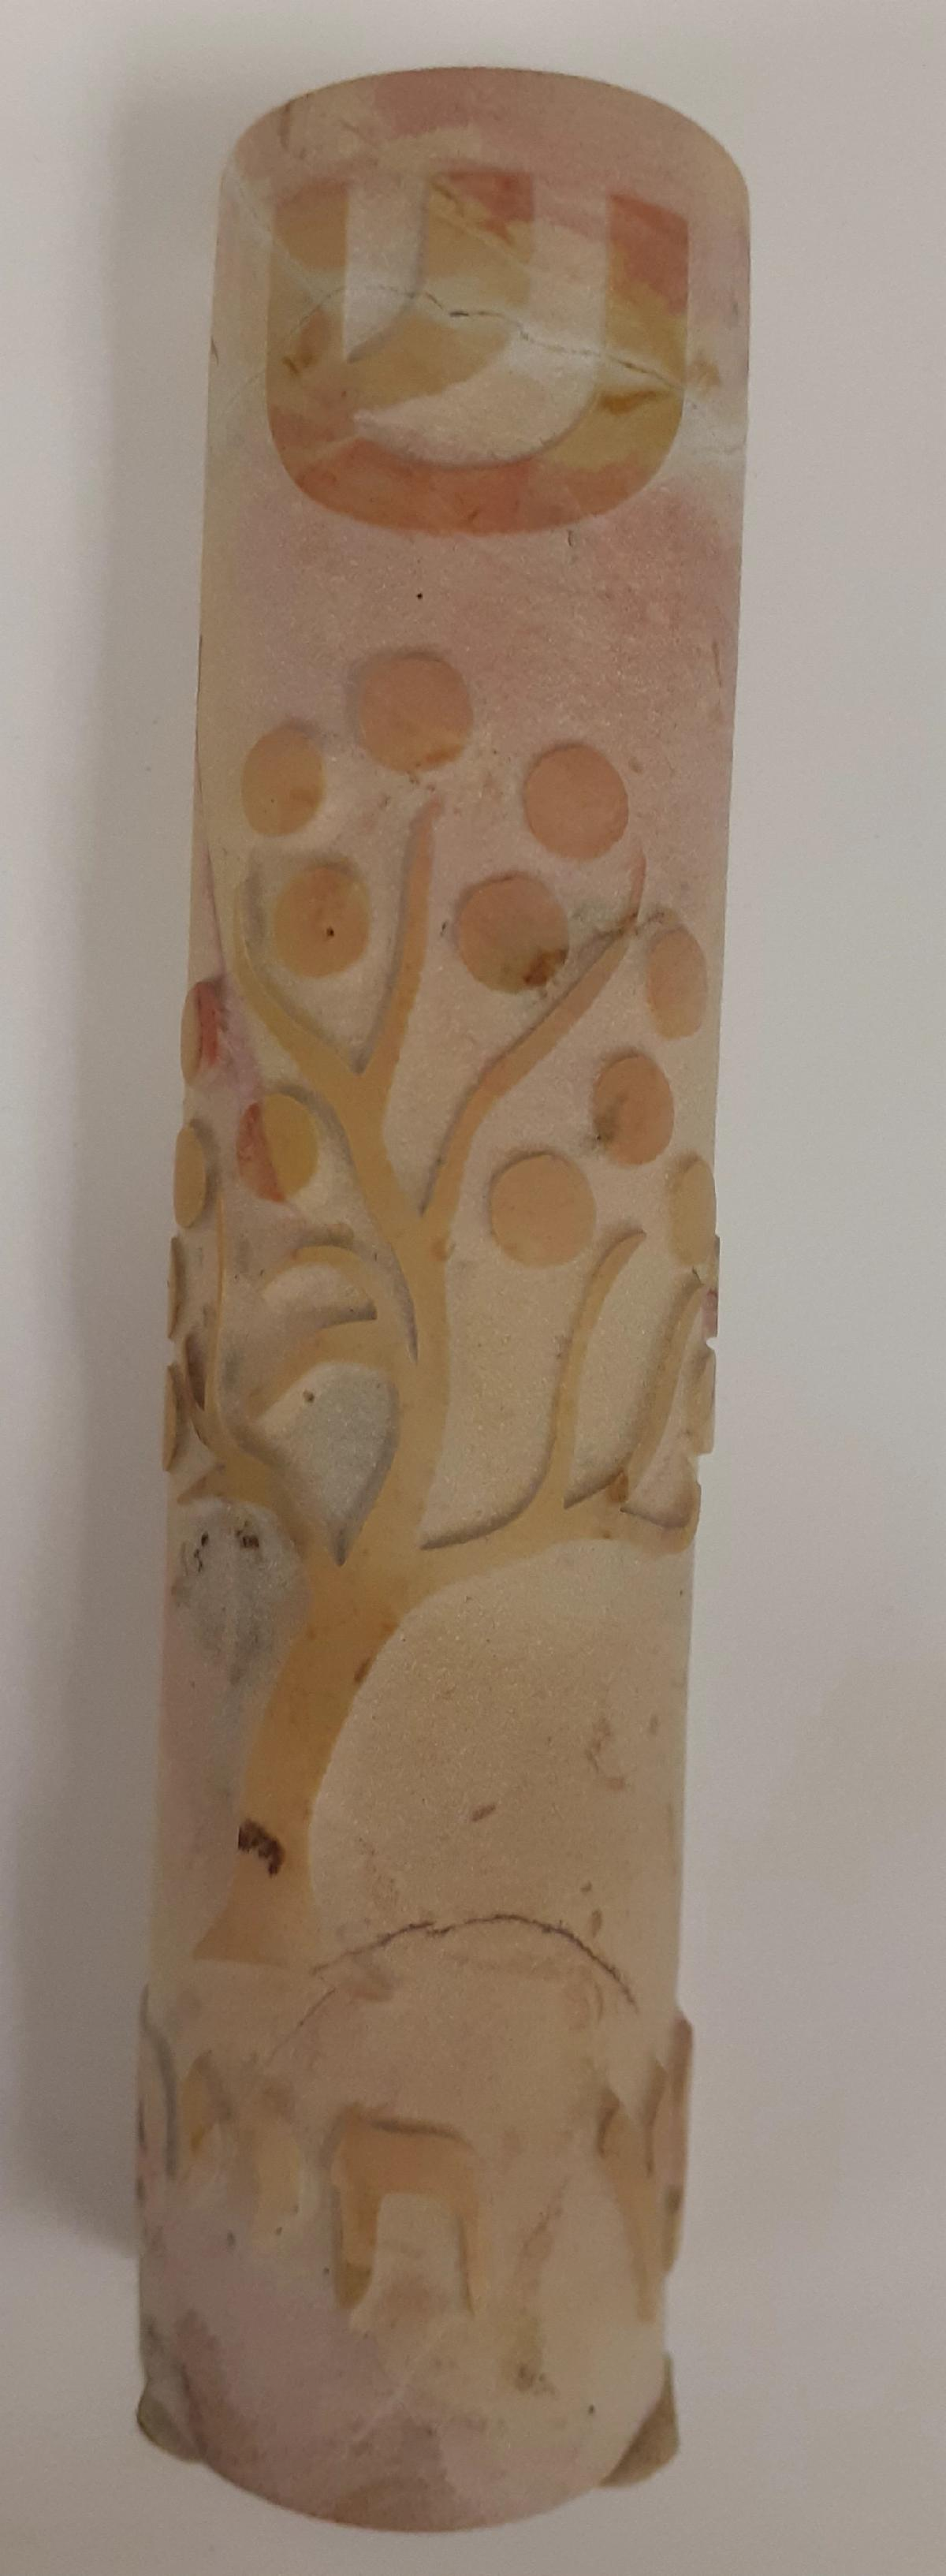 Jerusalem Stone Tree of Life Mezzuzah